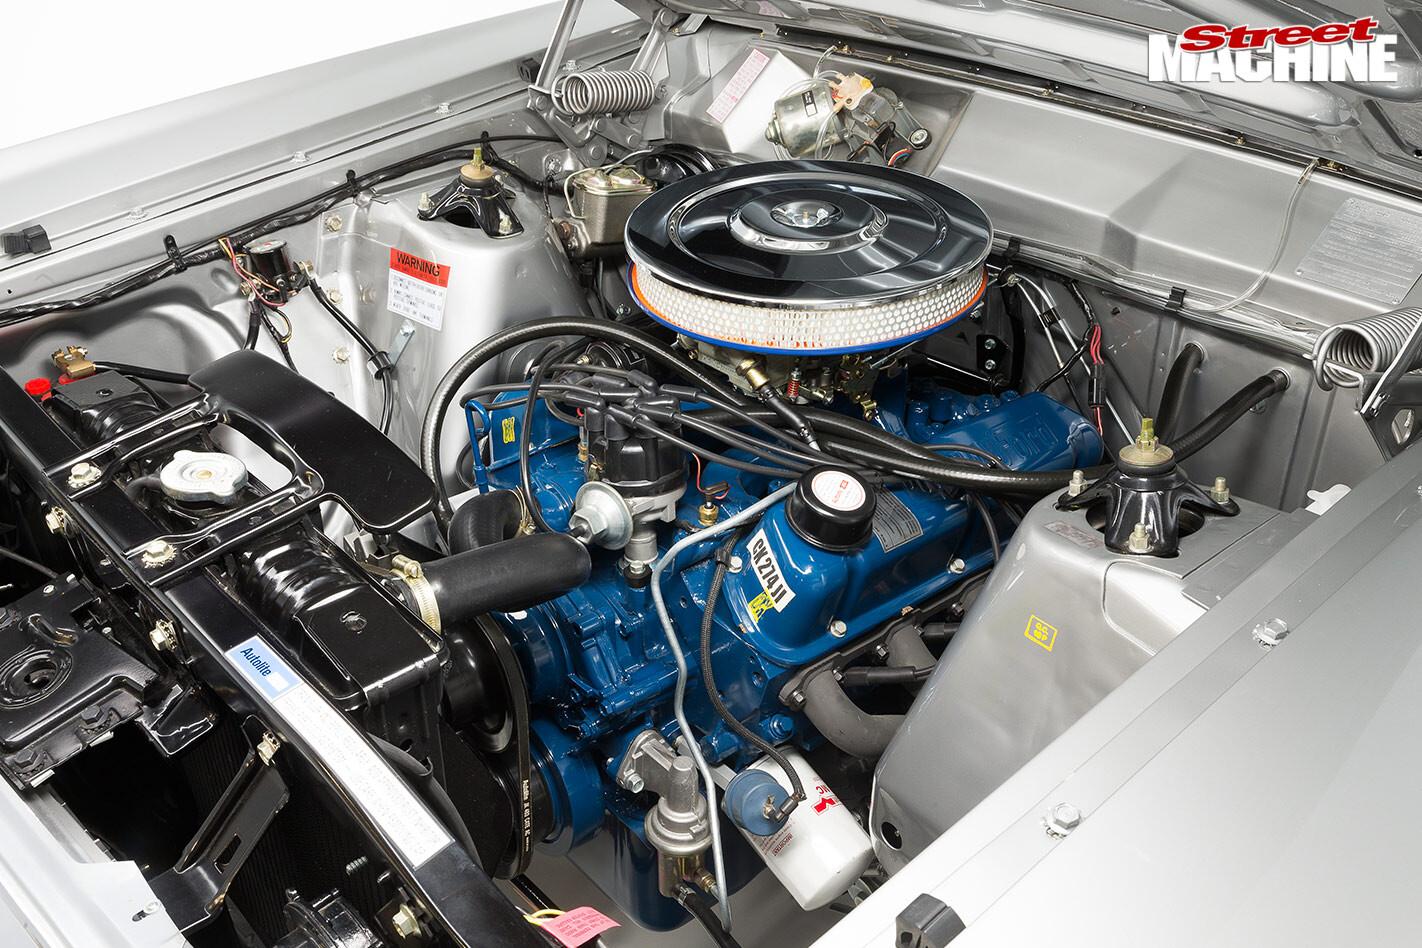 Ford Falcon XW GS panel van engine bay